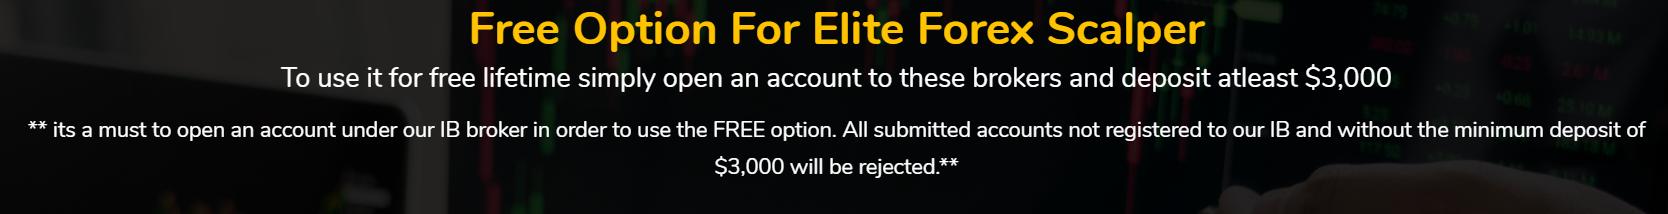 Elite Forex Scalper Pricing